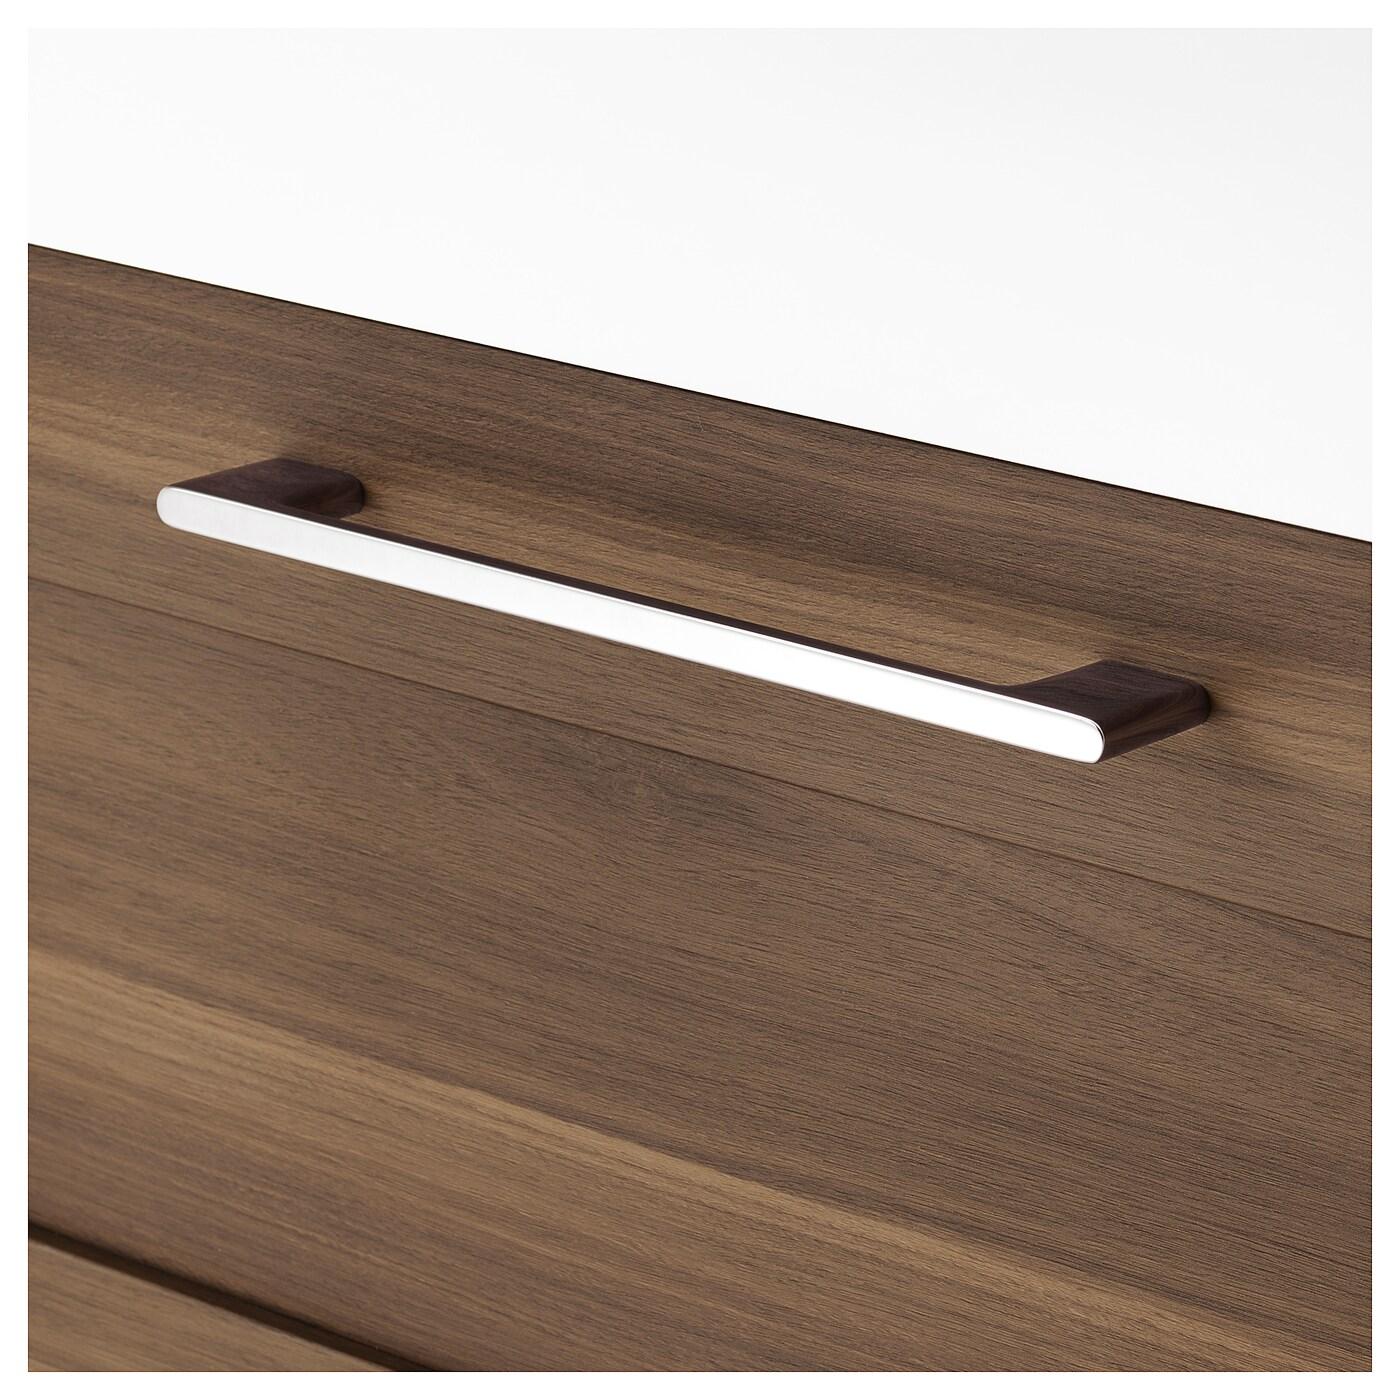 br viken godmorgon meuble lavabo 4tir motif noyer 120 x 48 x 68 cm ikea. Black Bedroom Furniture Sets. Home Design Ideas